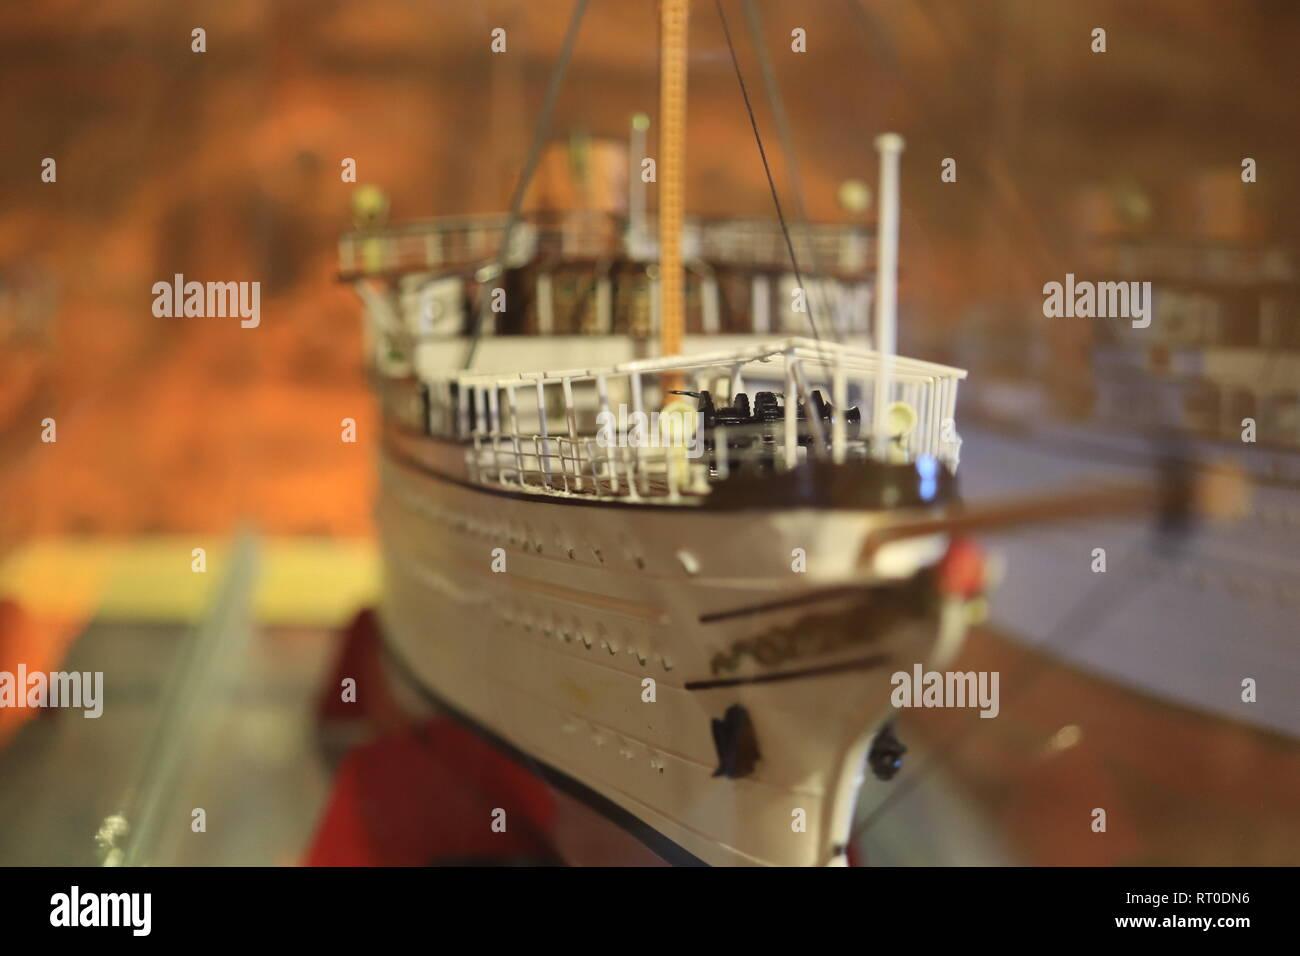 Scaly ship model. White boat layout. Macro closeup. - Stock Image